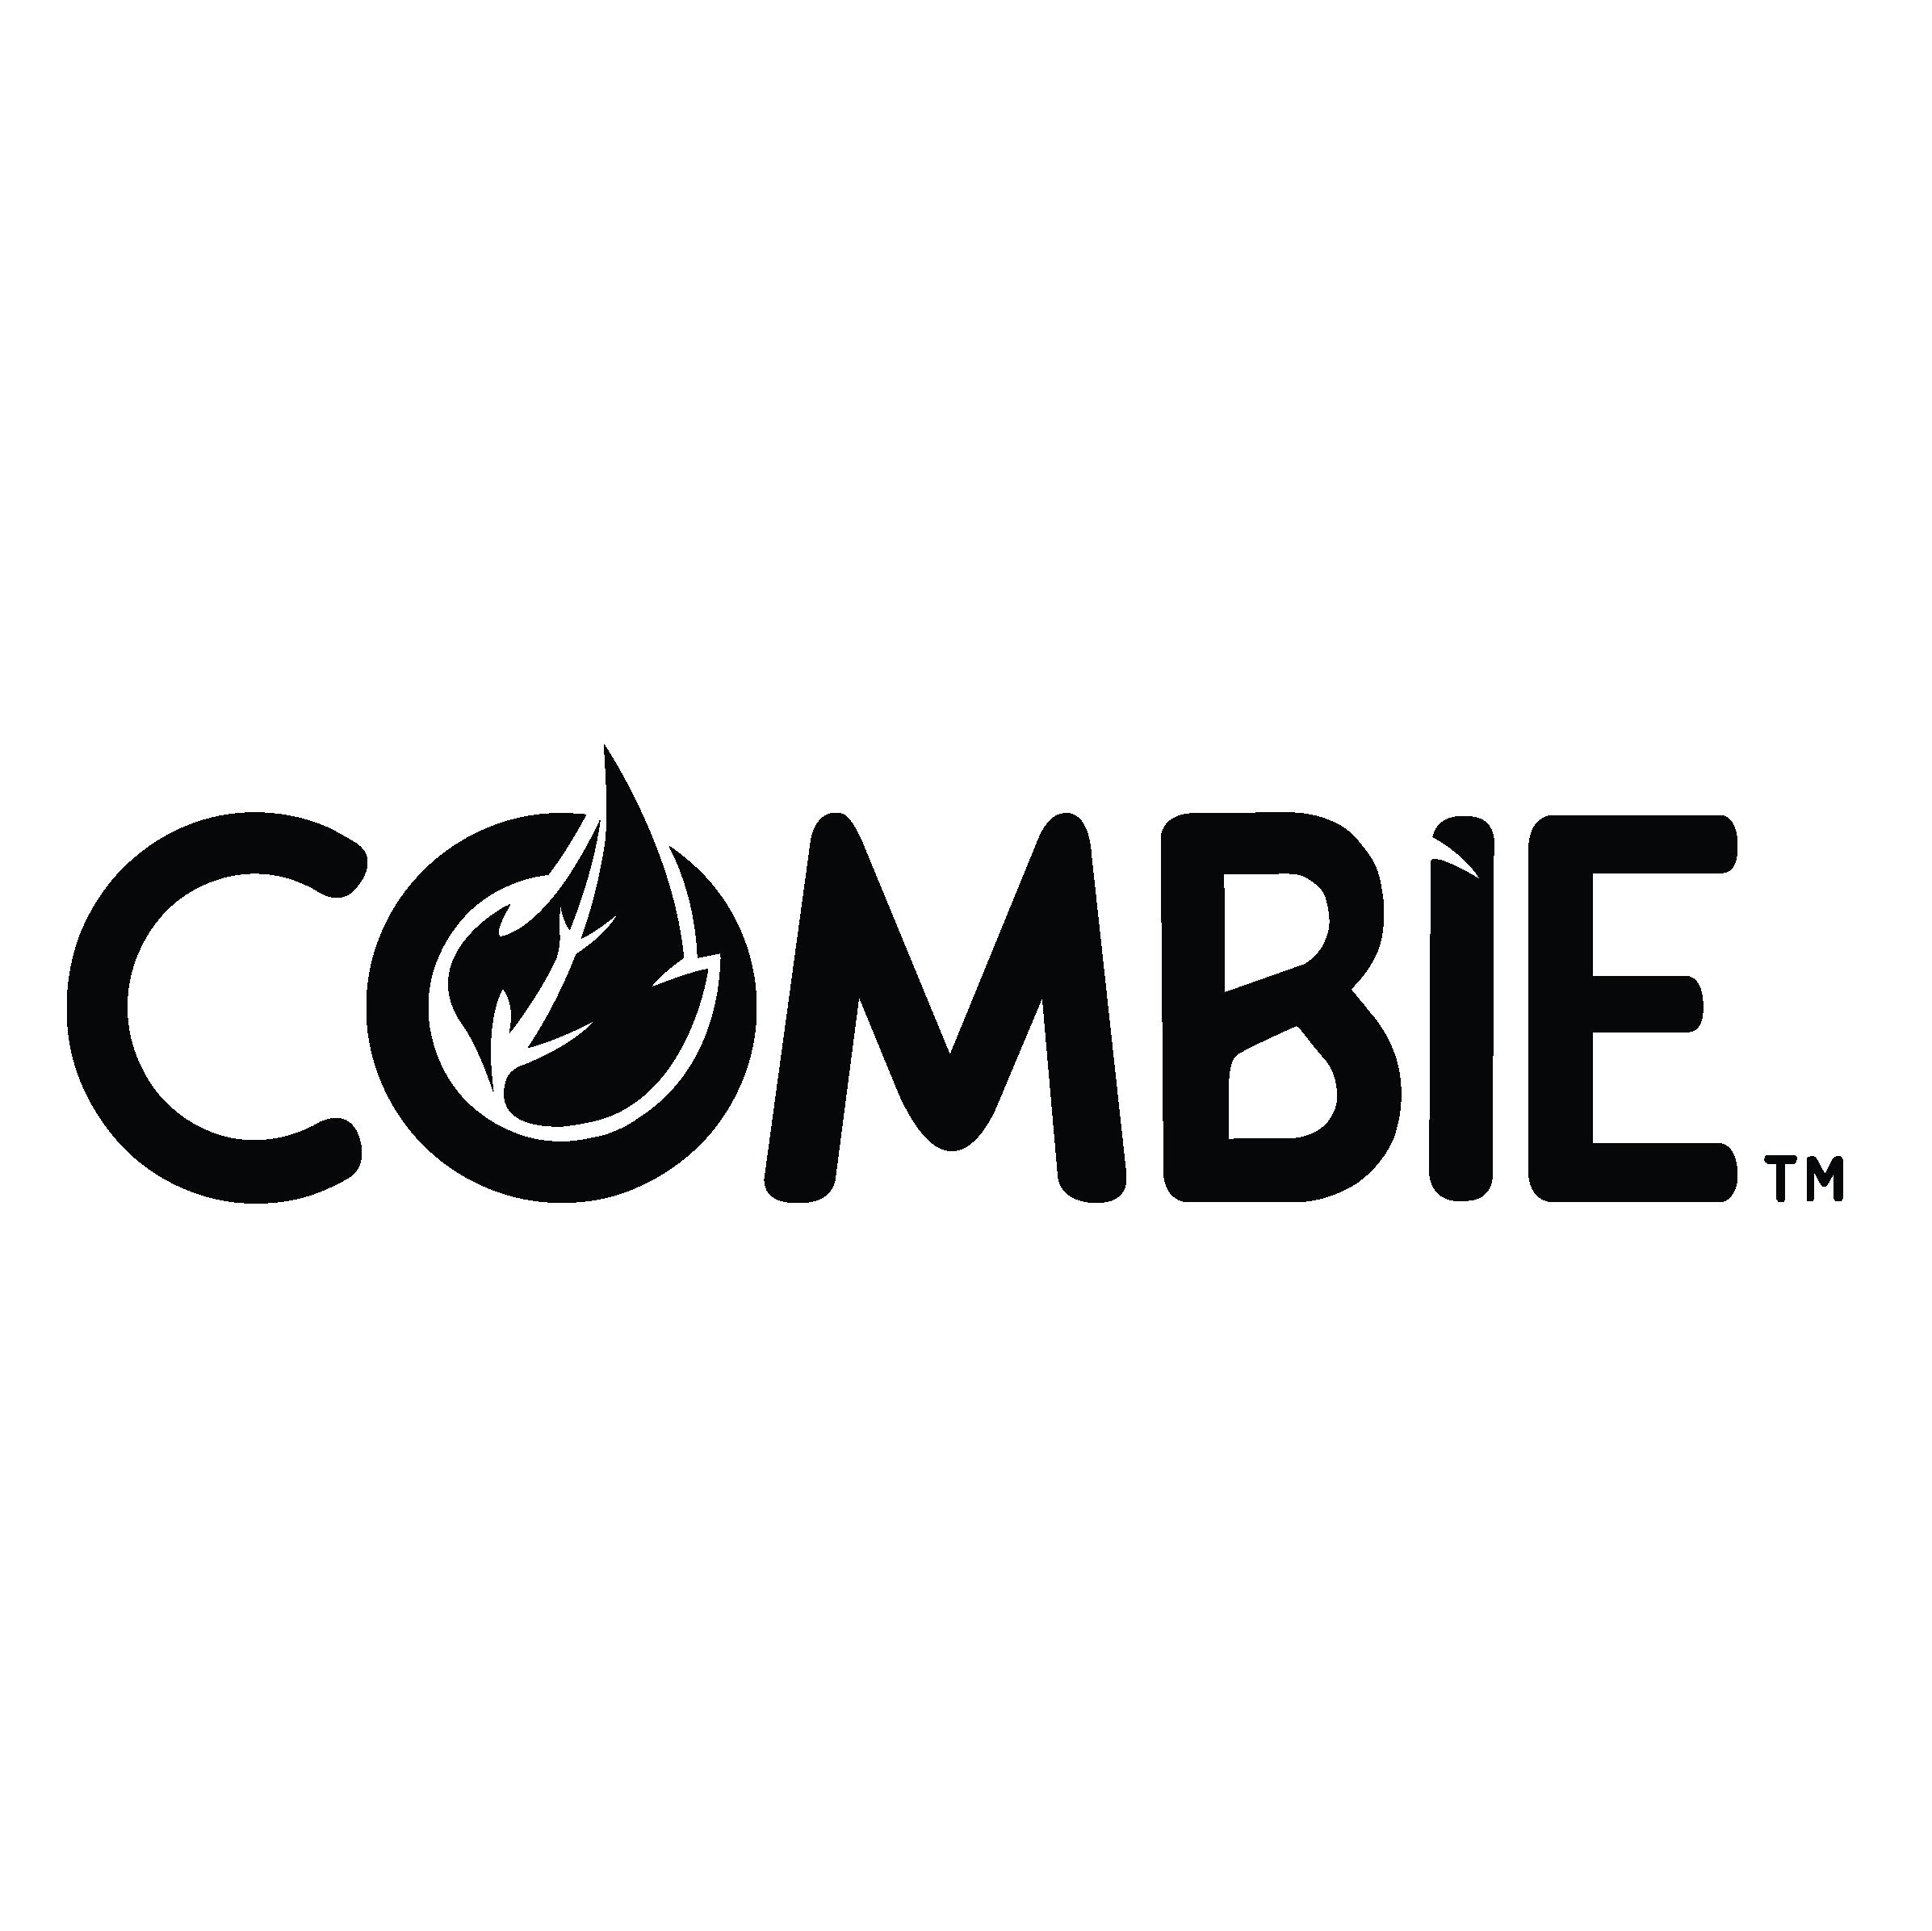 Combie